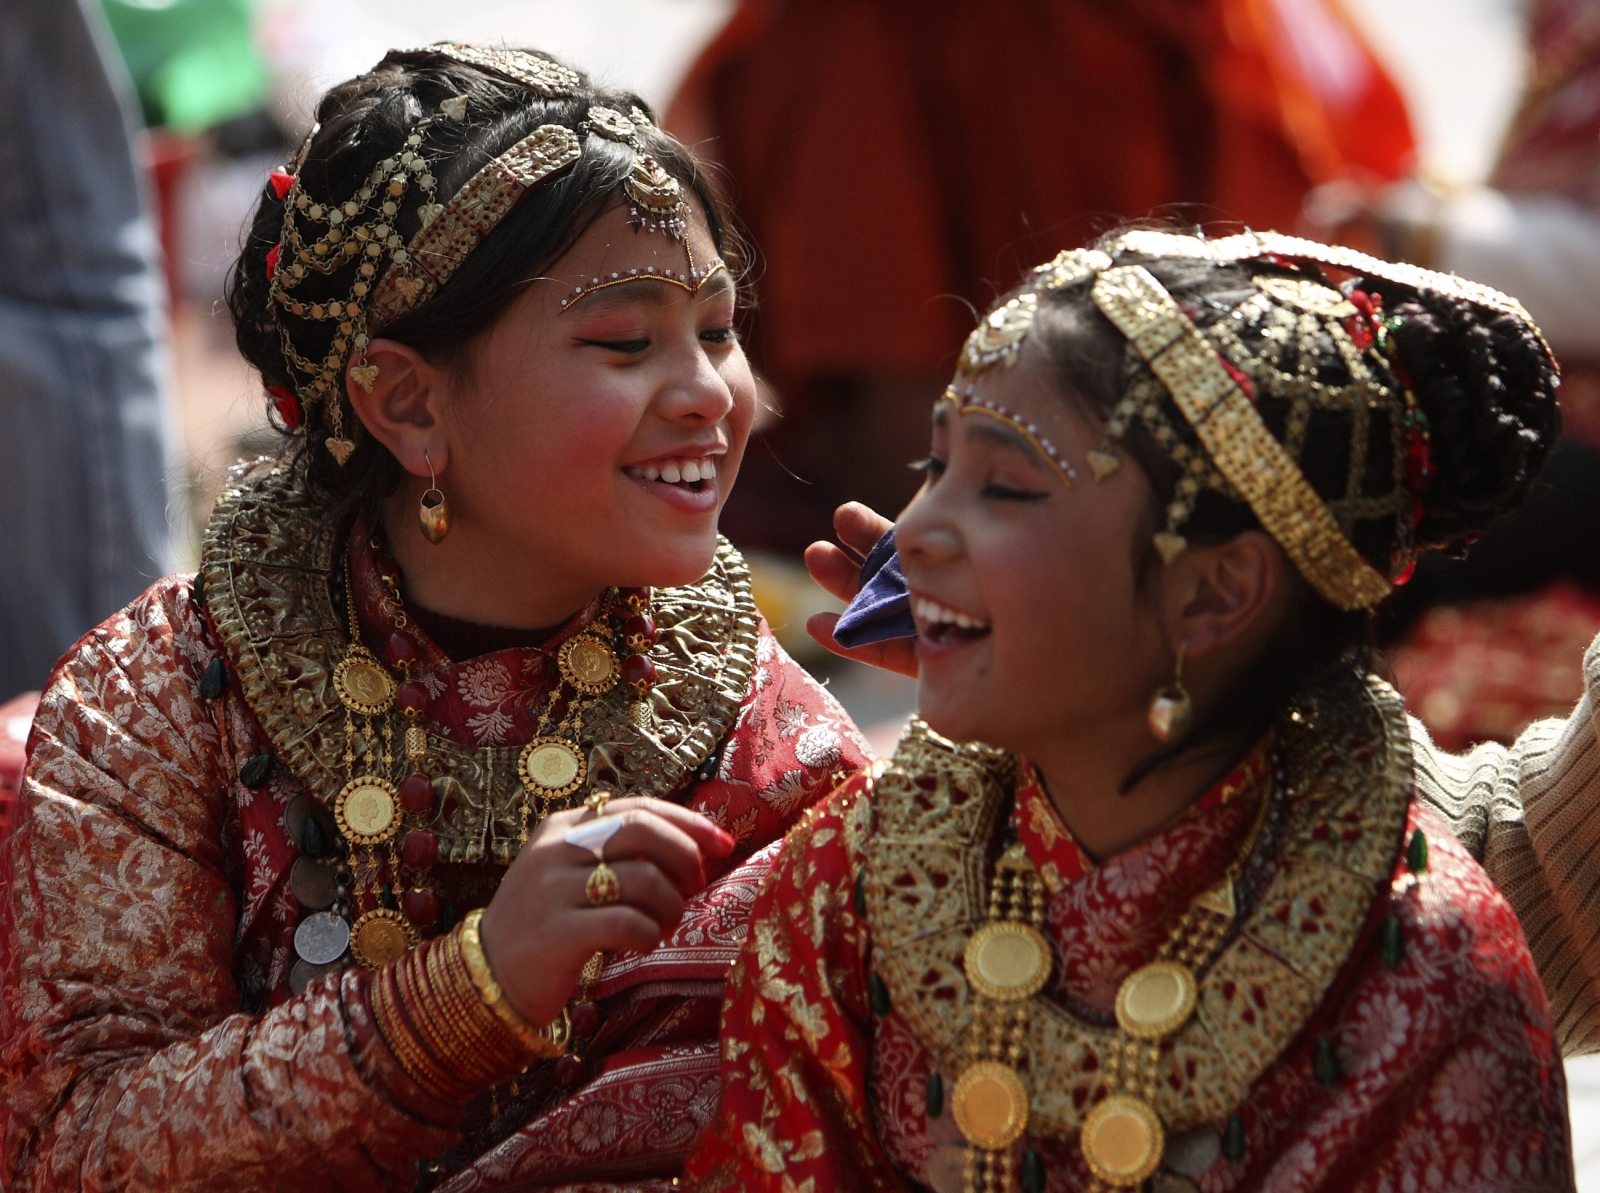 Nepal child marriage